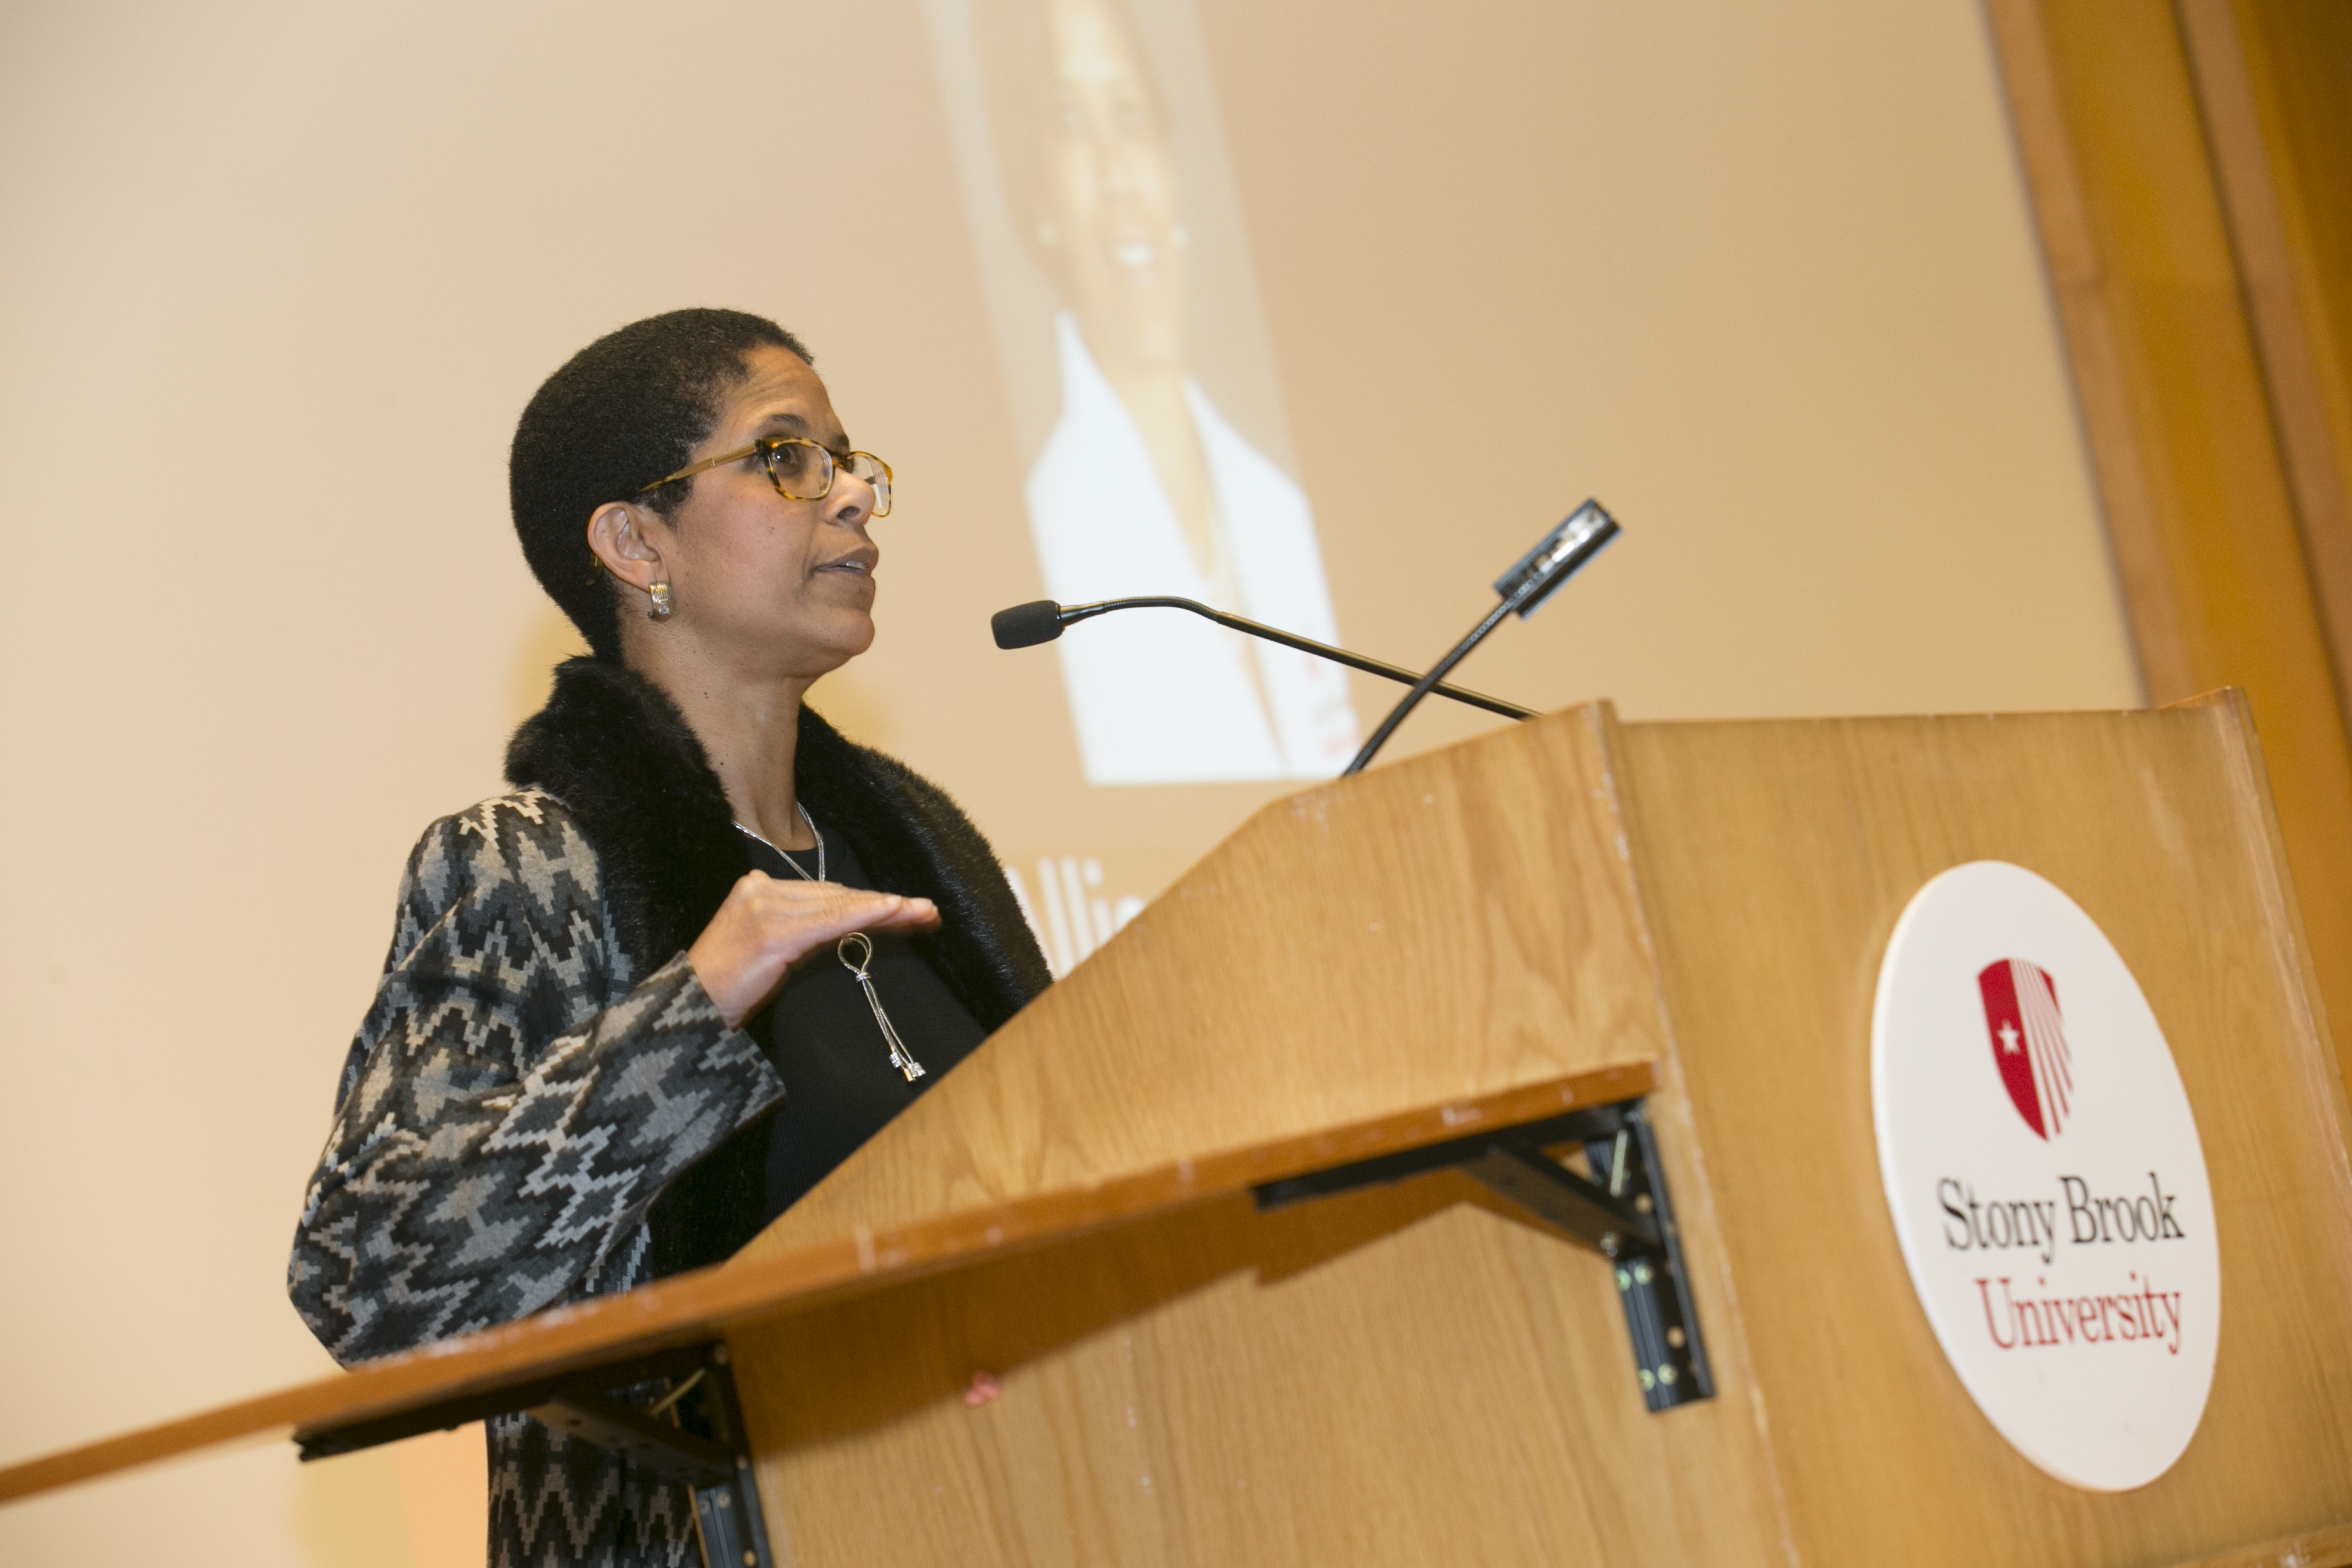 Dr. Allison McLarty, Opening Ceremony keynote speaker